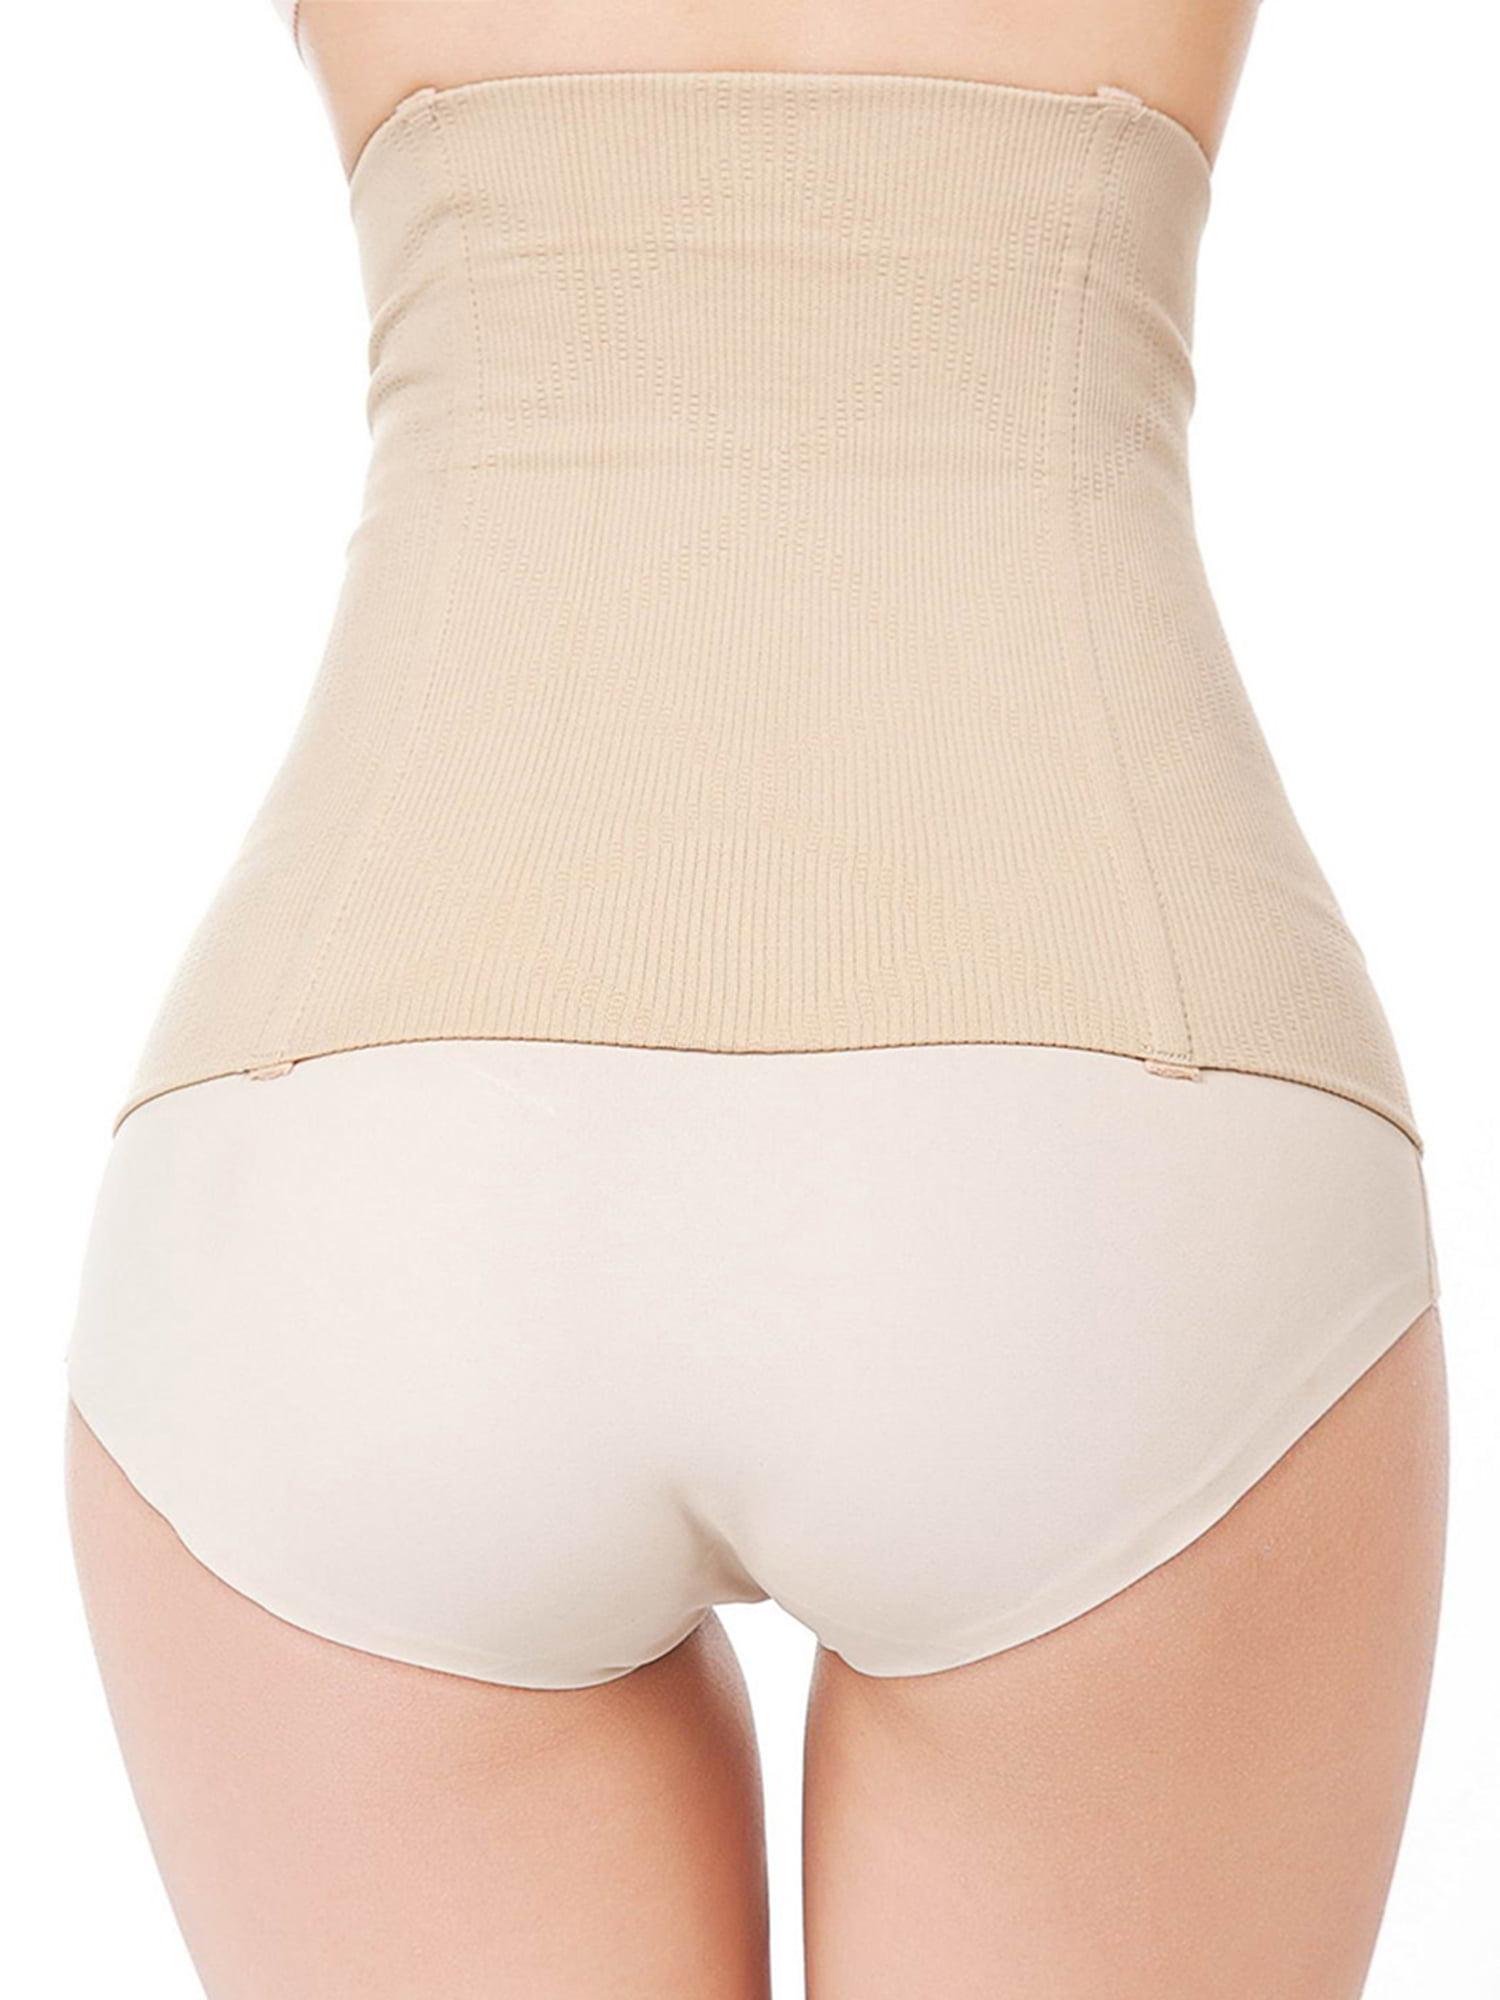 Women/'s Recovery Waist Trainer Postpartum Belly Tummy Control Belt Body Shaper